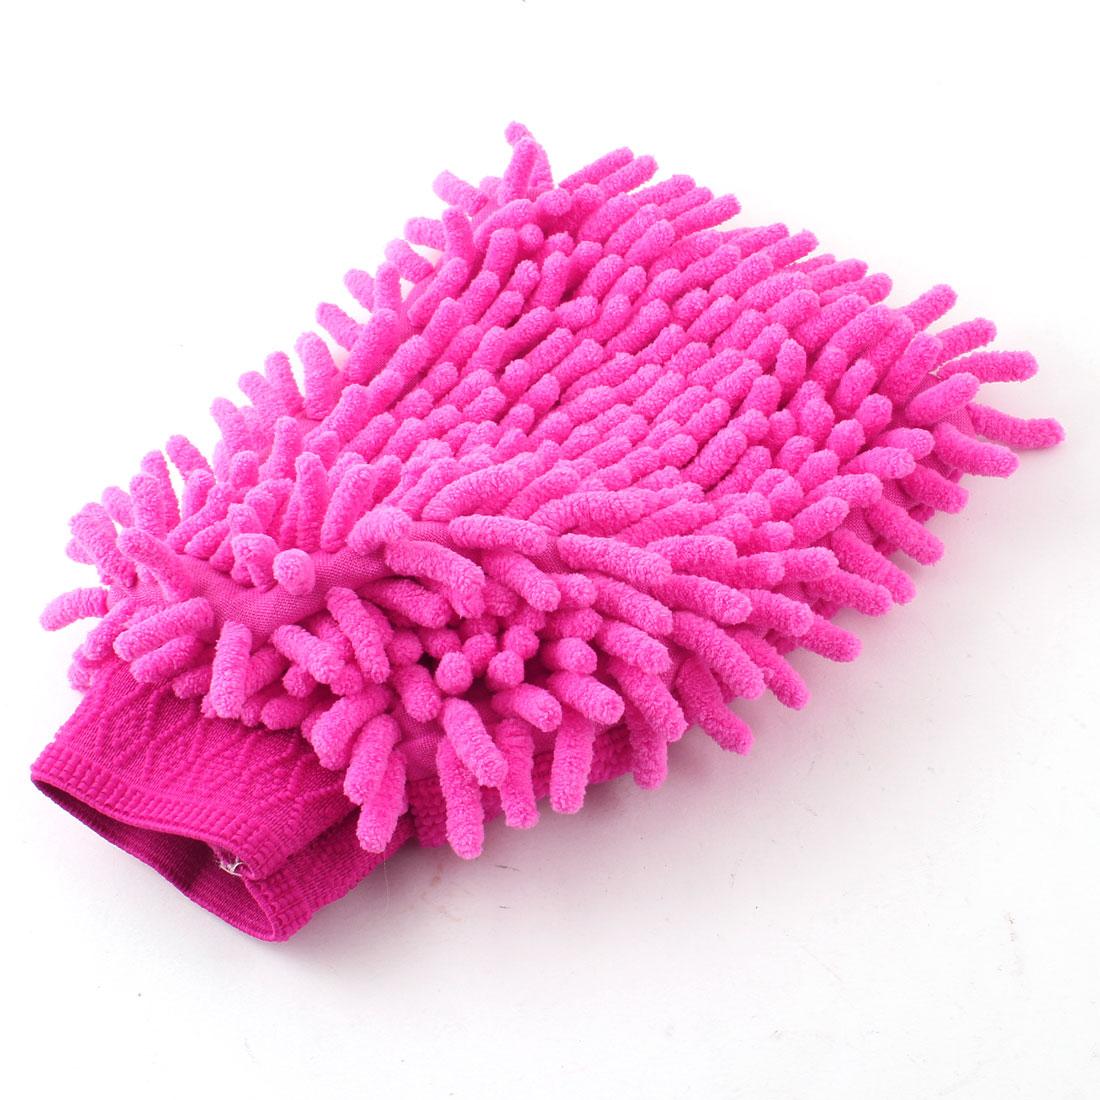 Car Washing Cleaning Single Side Microfiber Mitt Glove Fuchsia